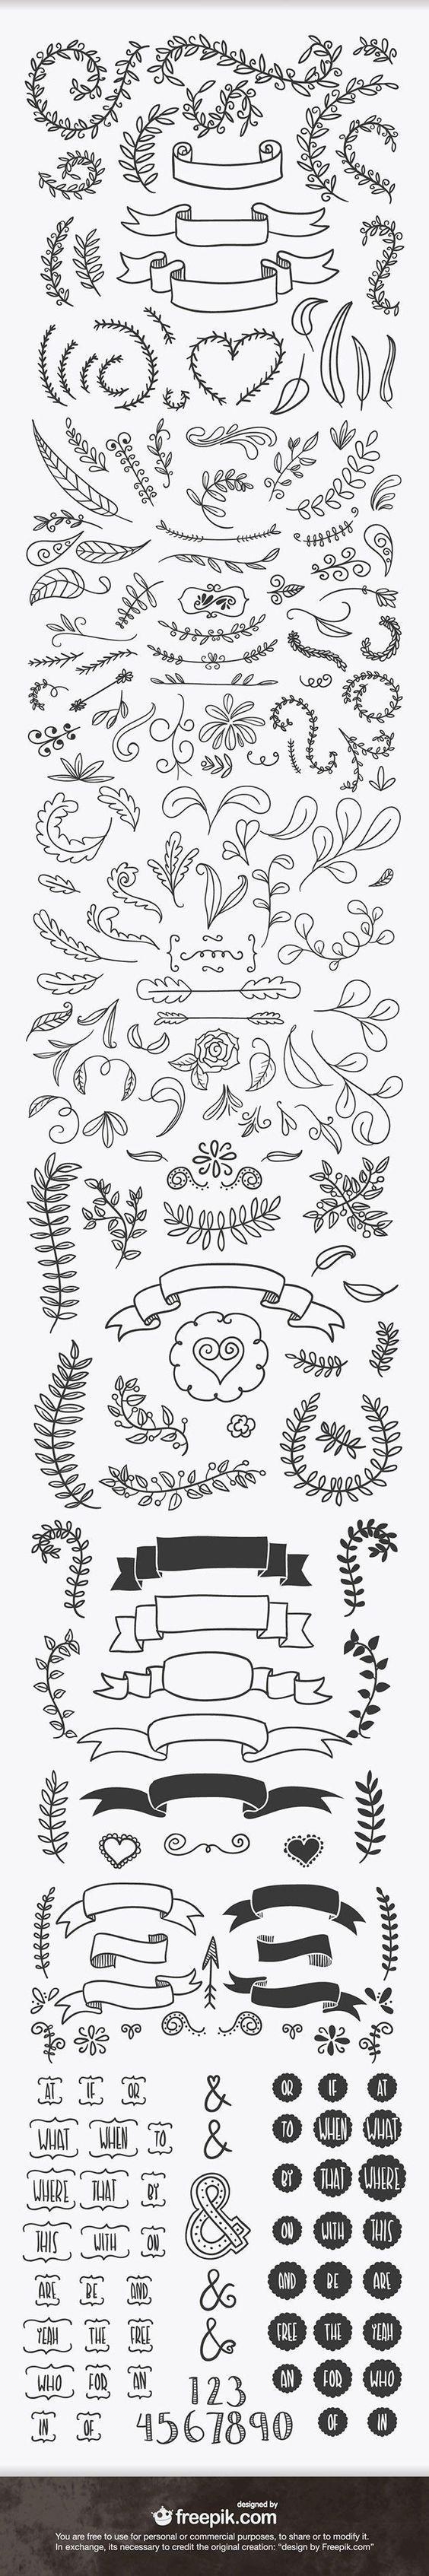 <a href='http://www.freepik.com/free-vector/hand-drawn-flowers-collection_1065449.htm'>Designed by Freepik</a>